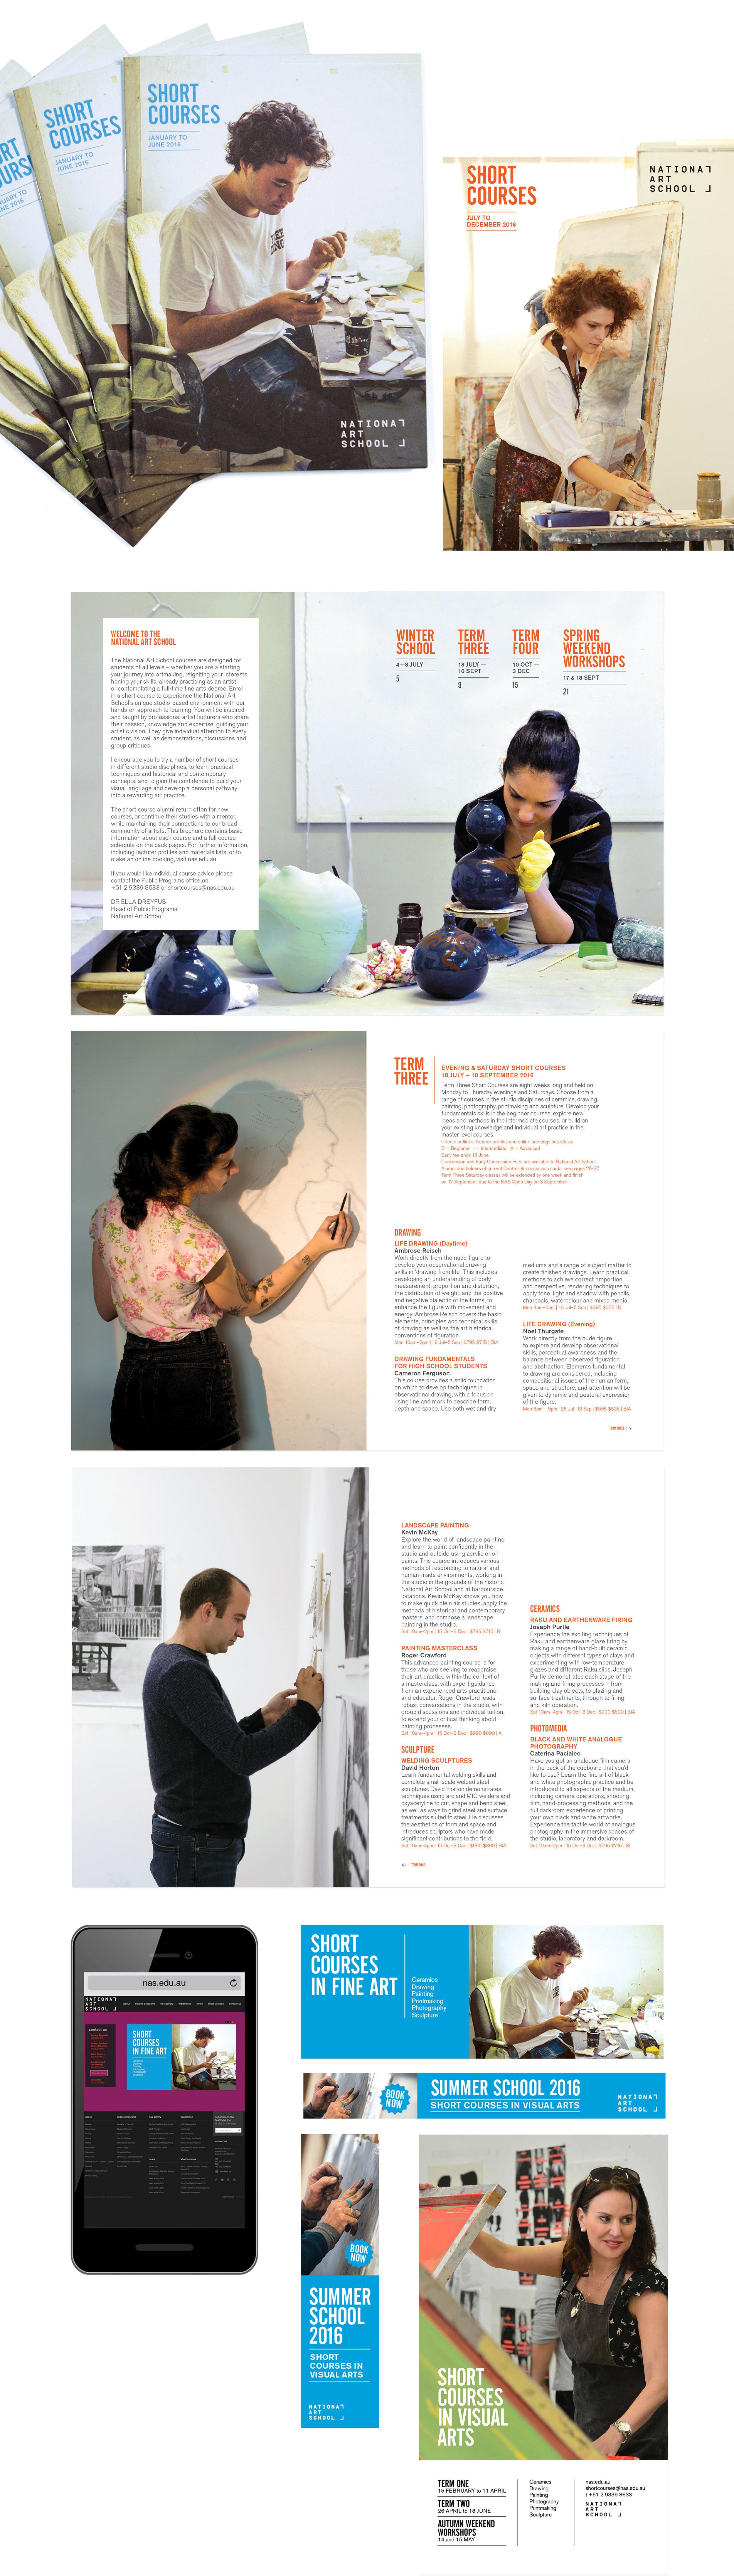 client  National Art School  project  Short Courses 2016 | brochures, digital ads & banners